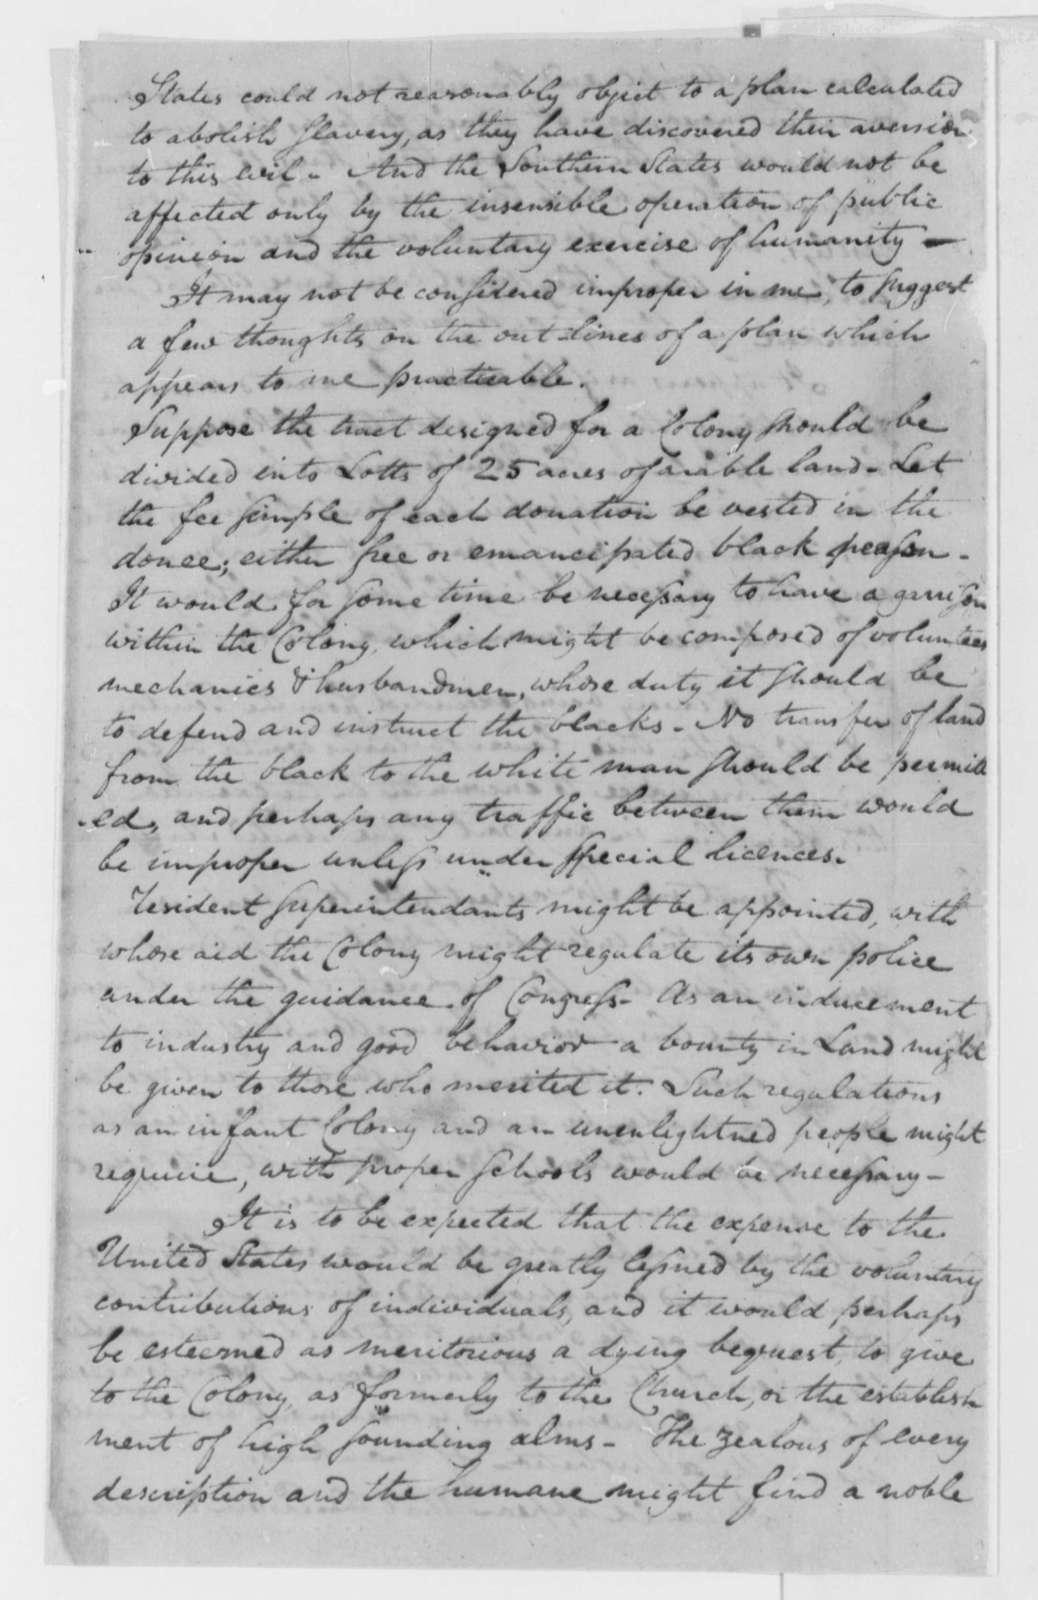 John Coburn to Thomas Jefferson, February 22, 1802